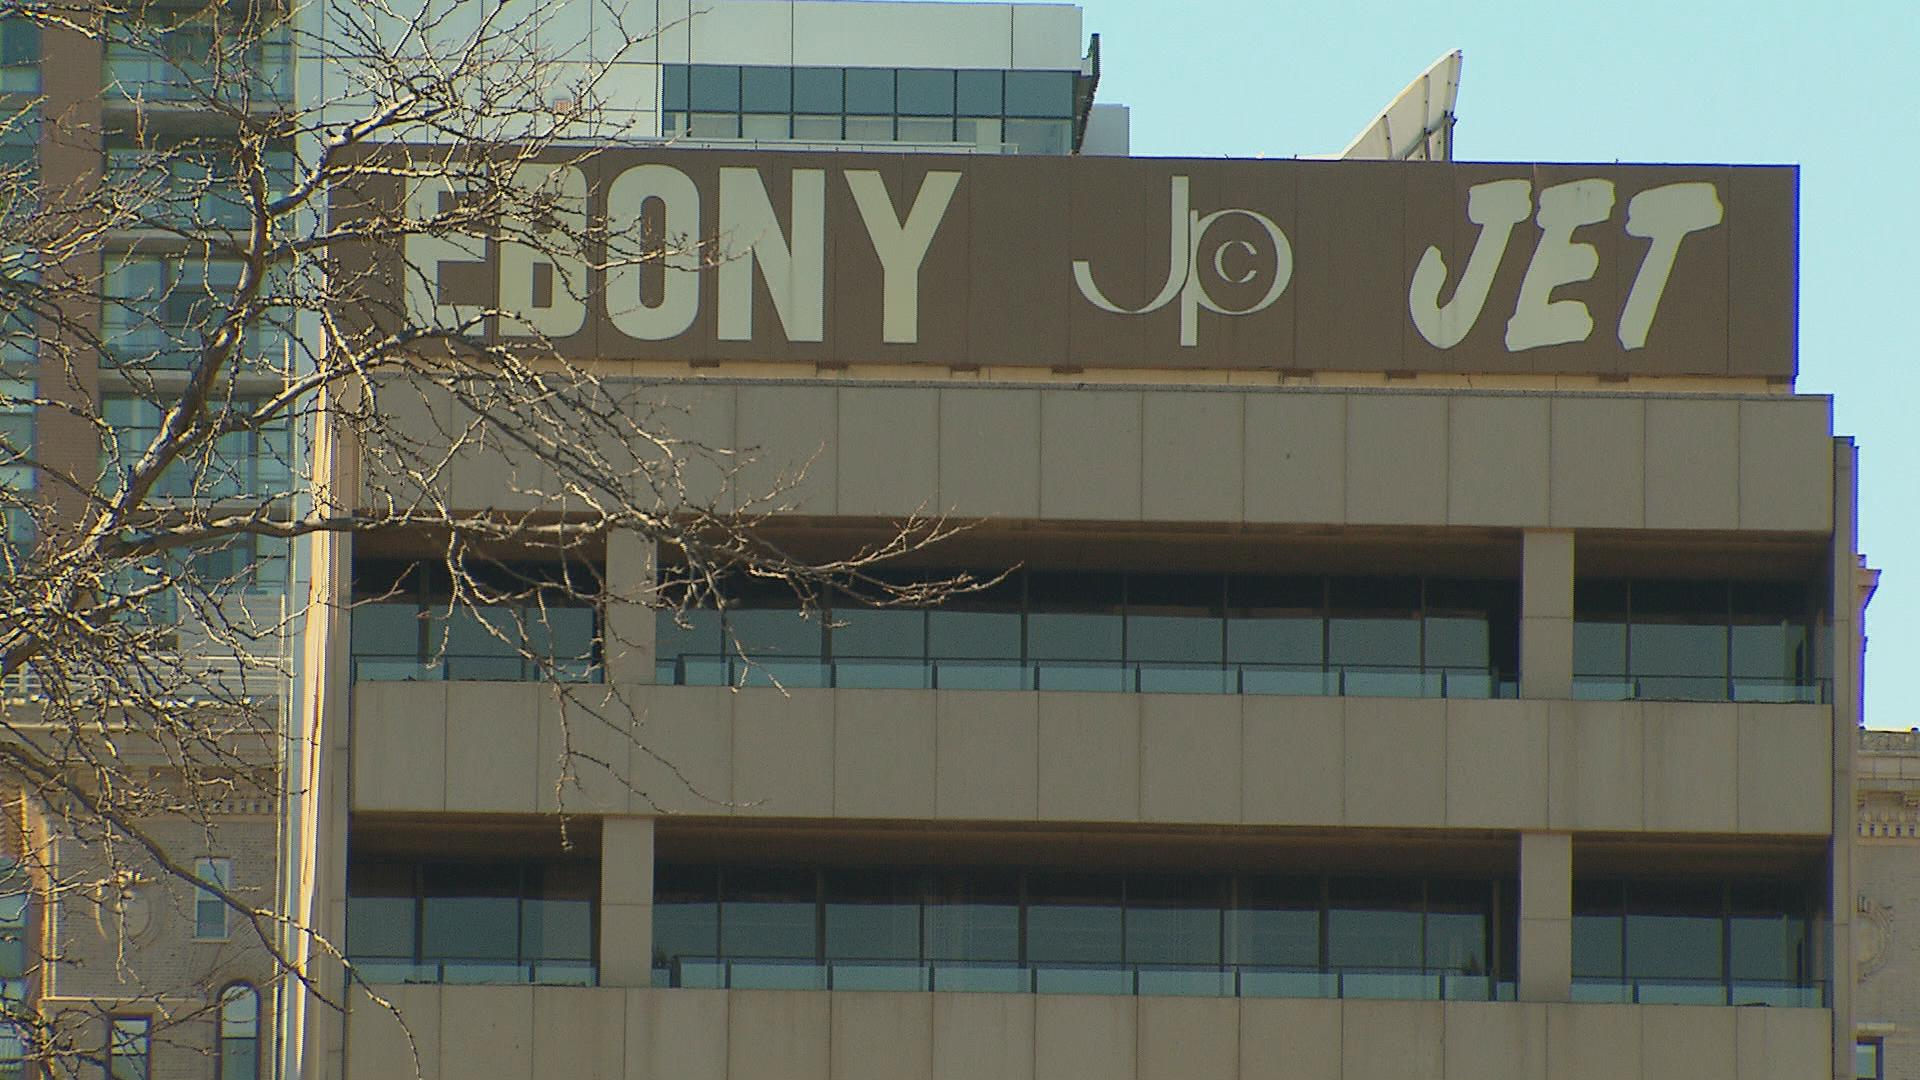 Ebony jet building